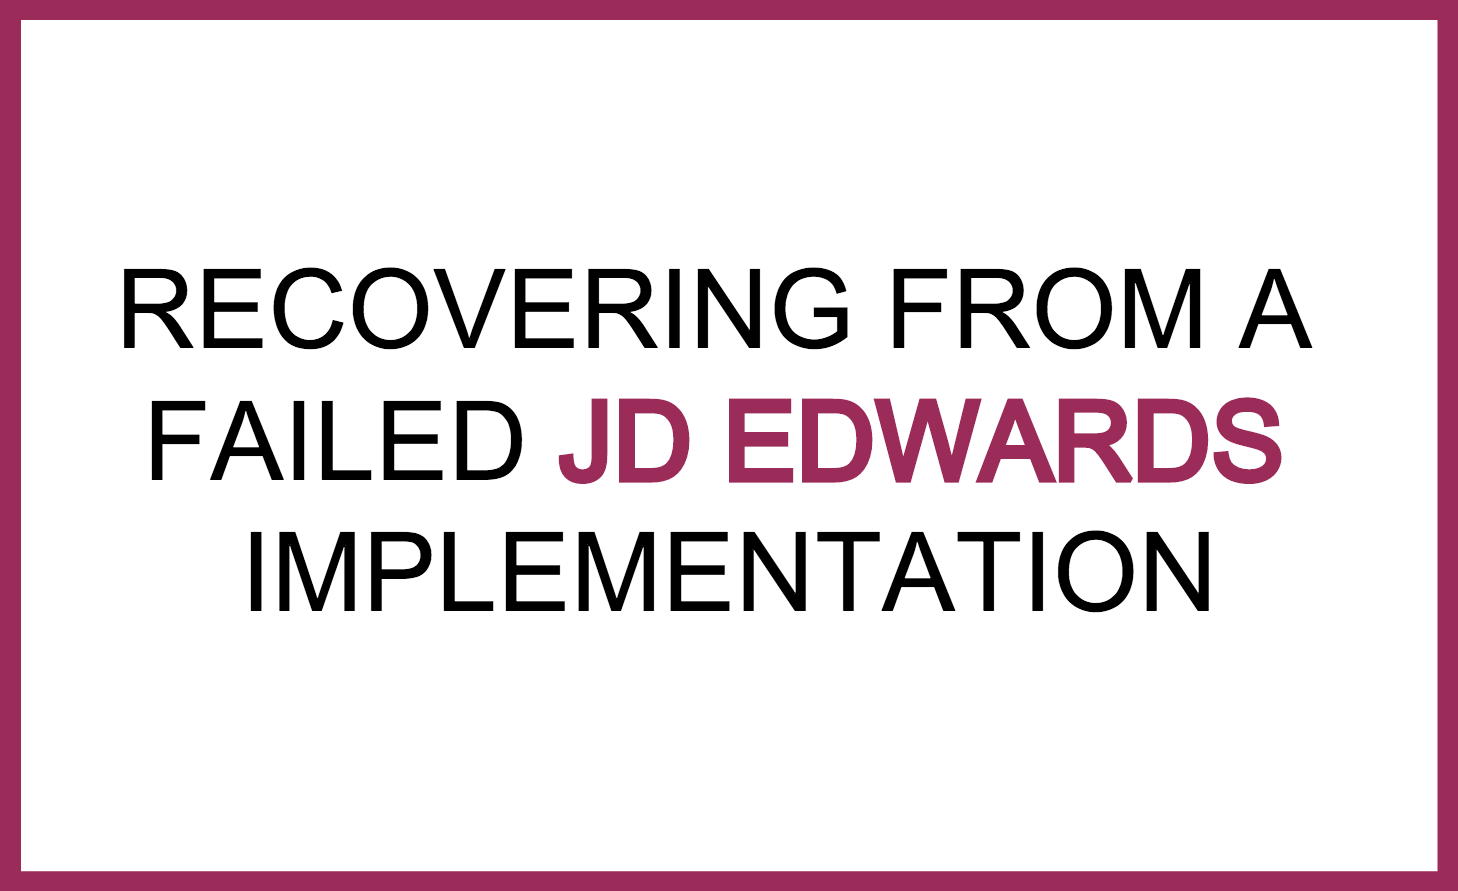 Failed JDE implementation.png